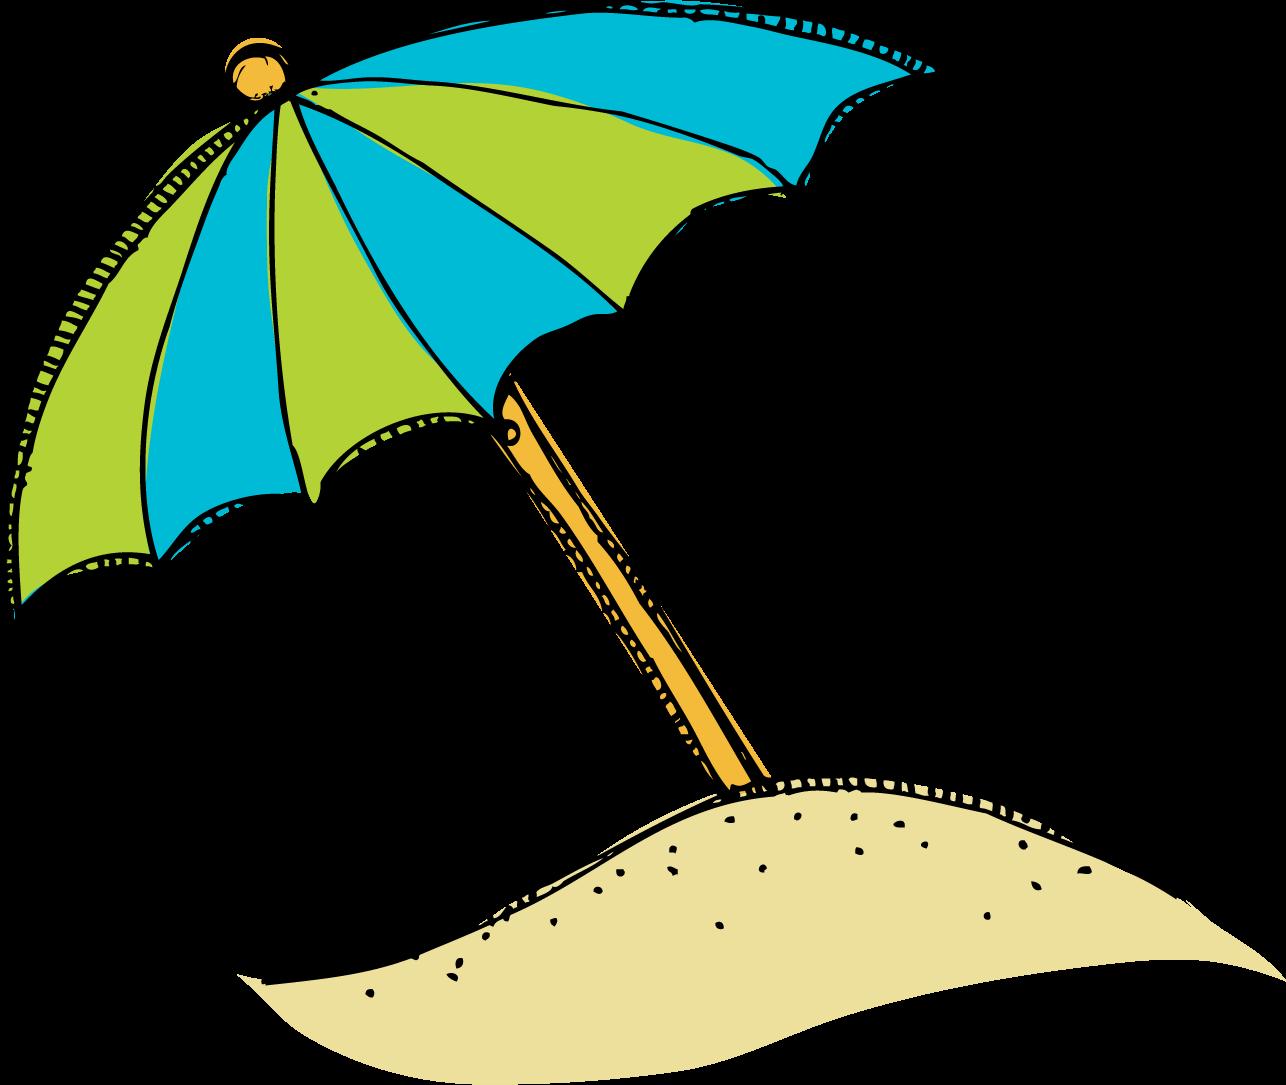 Clipart Beach Umbrella - Viewing Gallery